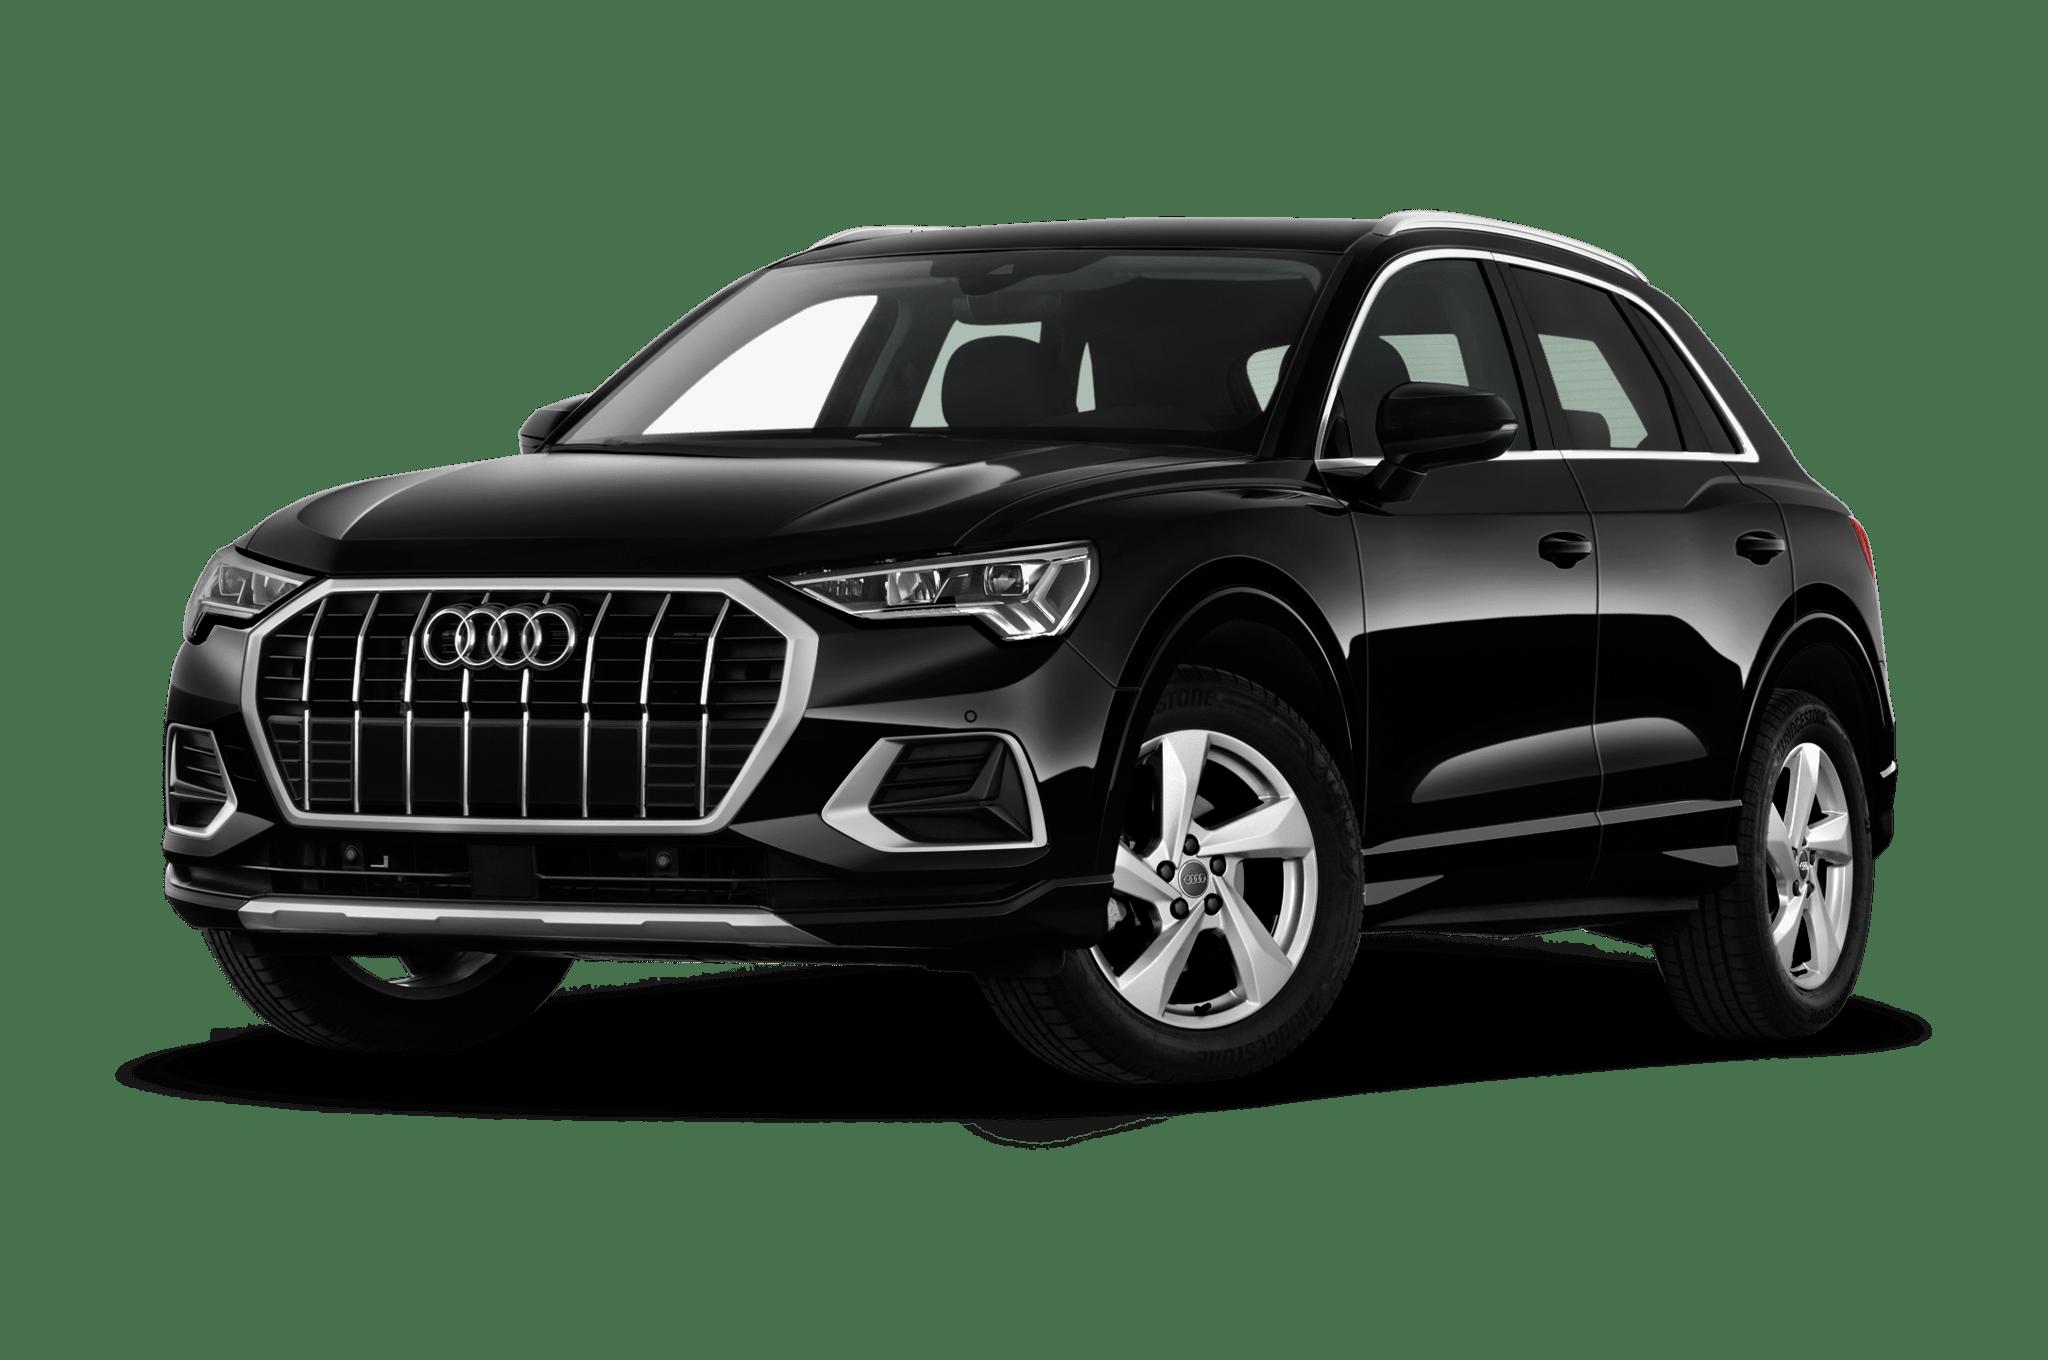 Noleggio a lungo termine per privati Audi Q3